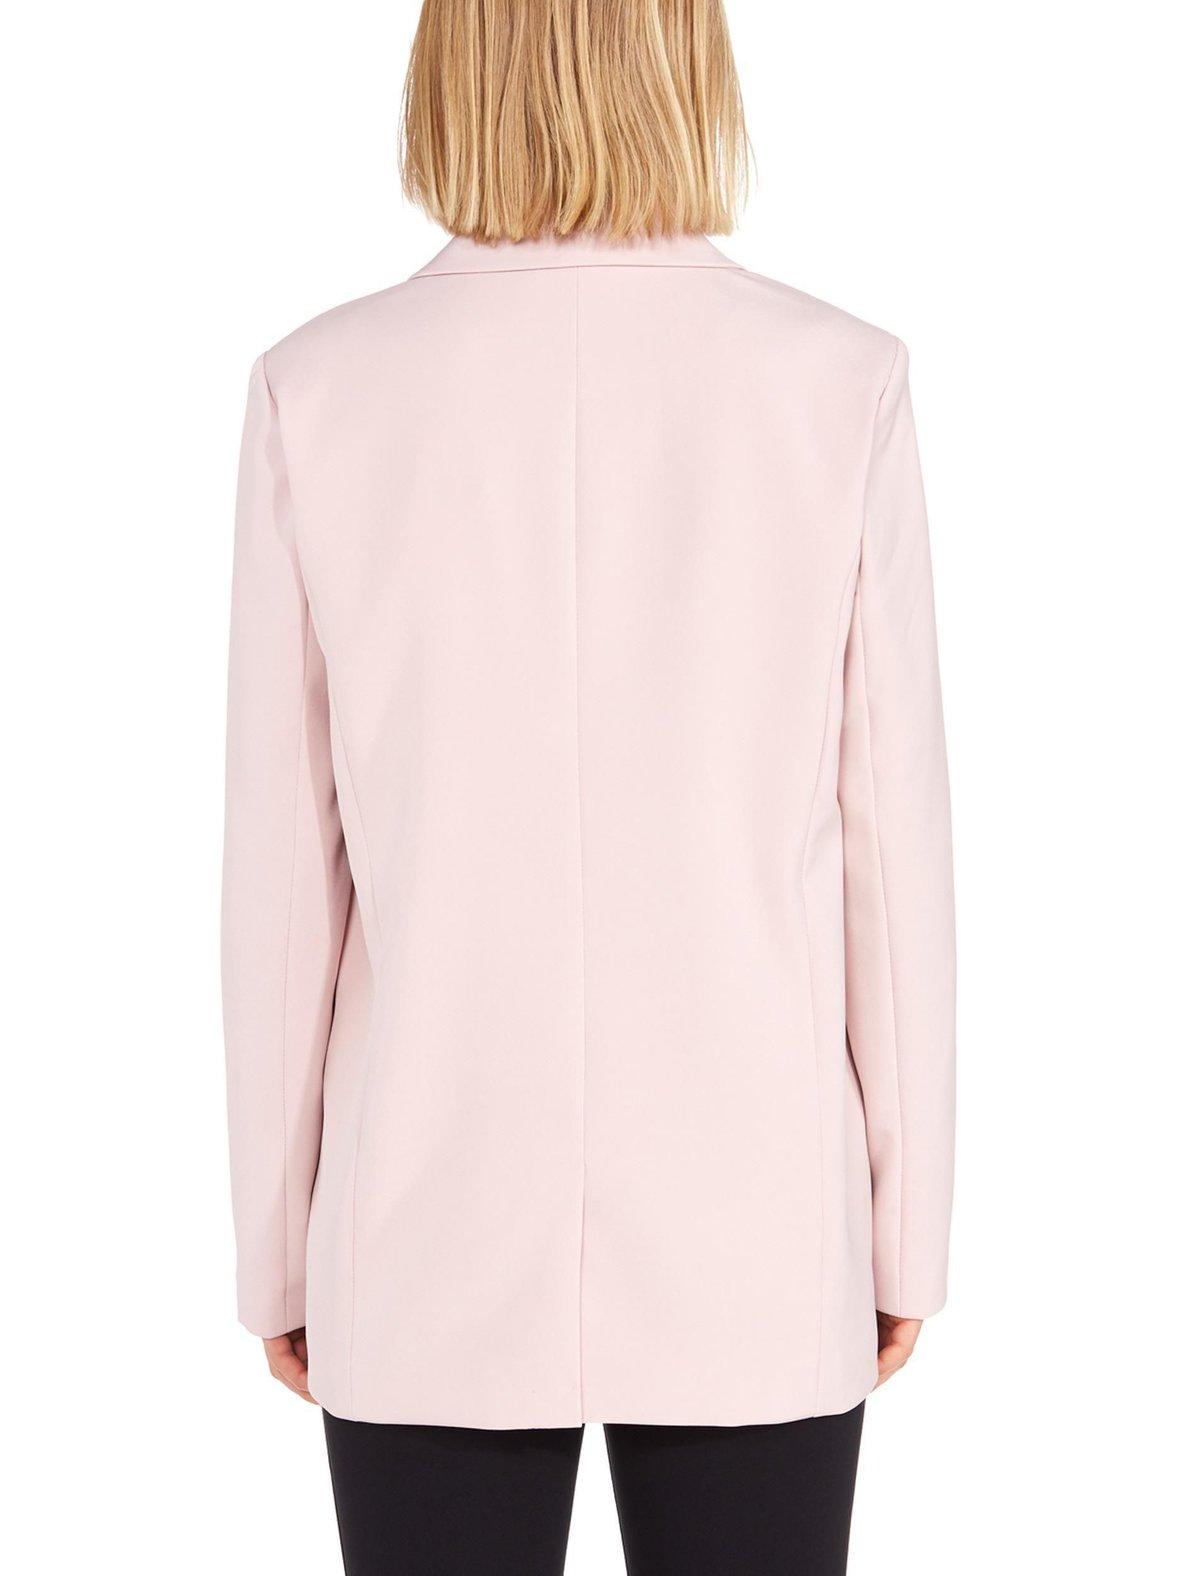 Iris (vaaleanpunainen) Vila ViBenna-jakku 14050712  b907cfd7f6